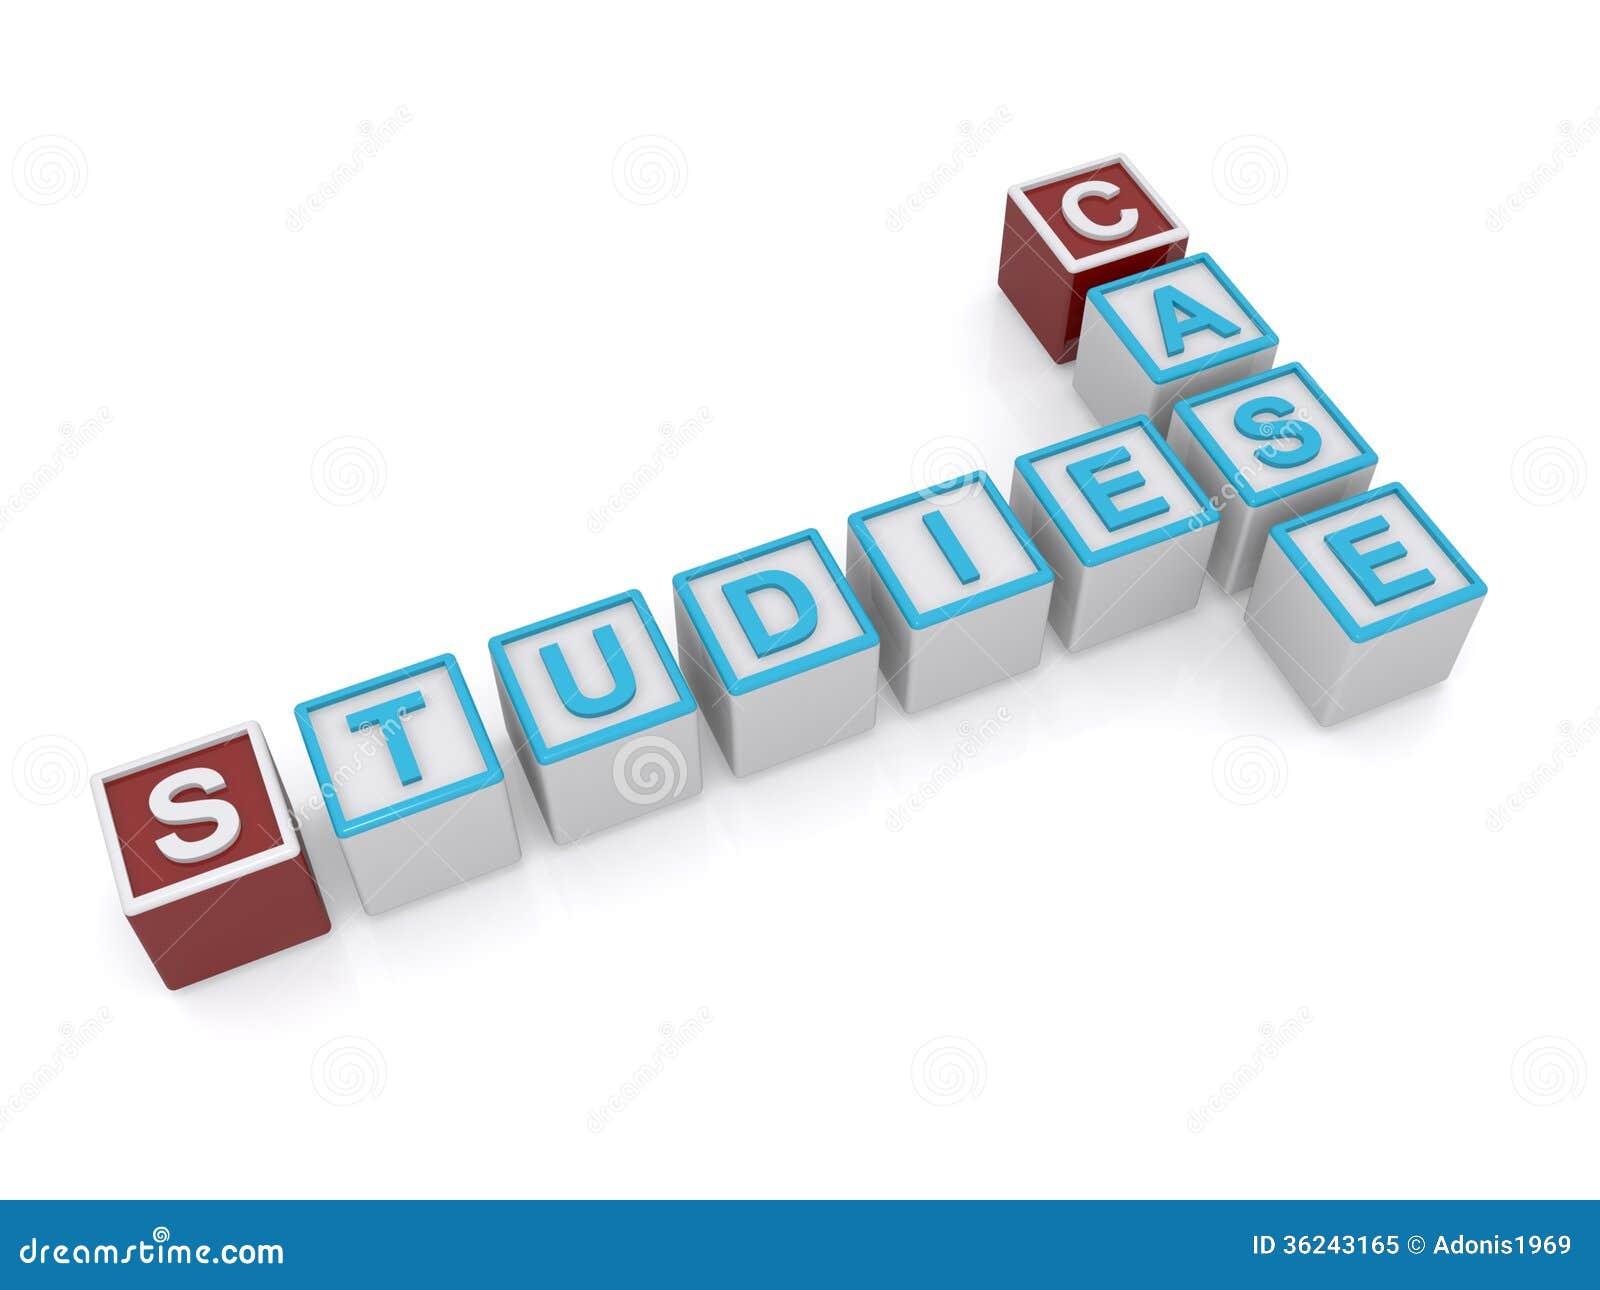 free download case studies entrepreneurship